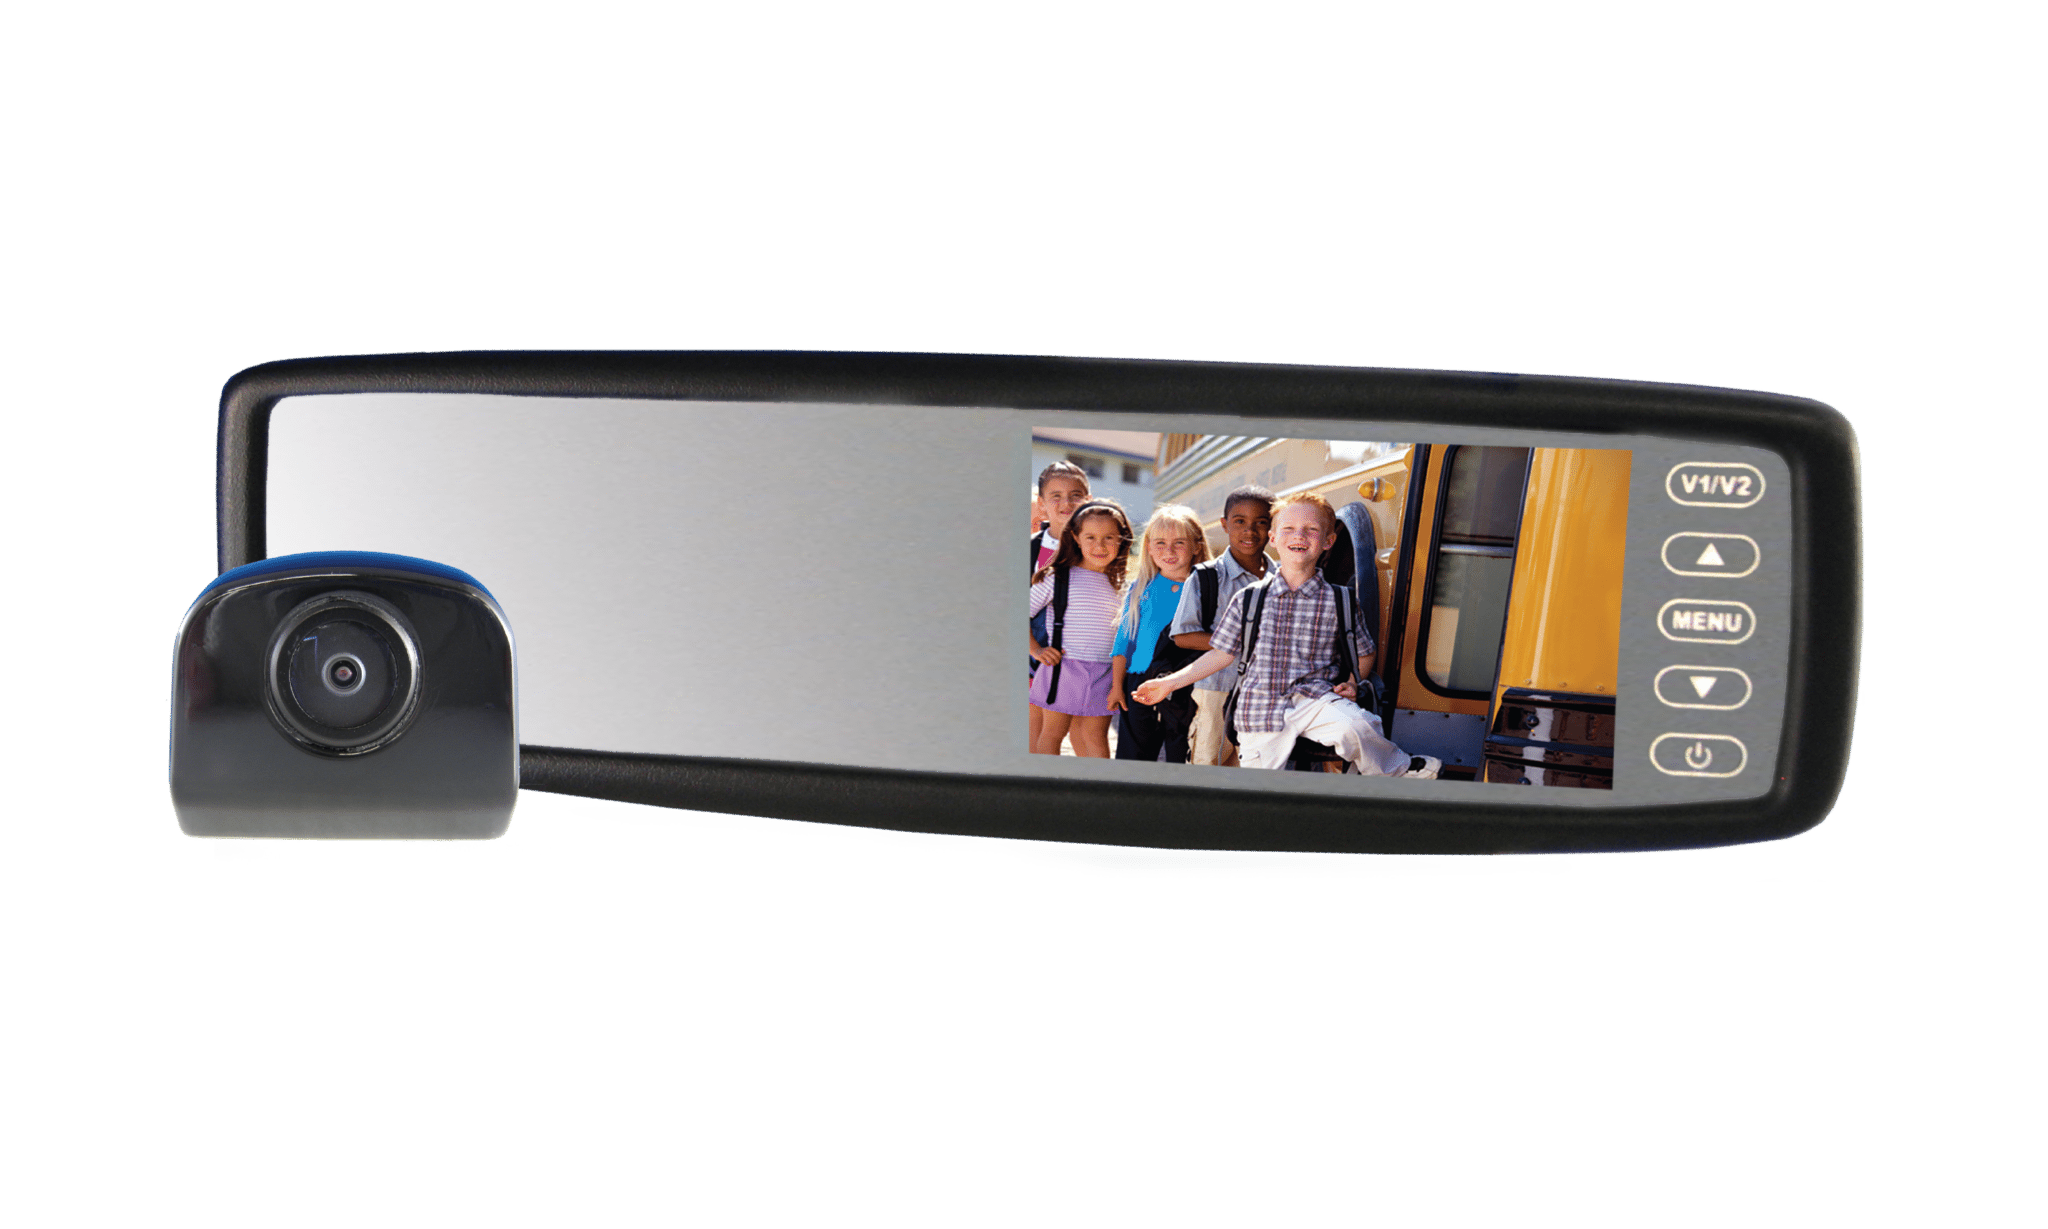 Premium rearview Cameras